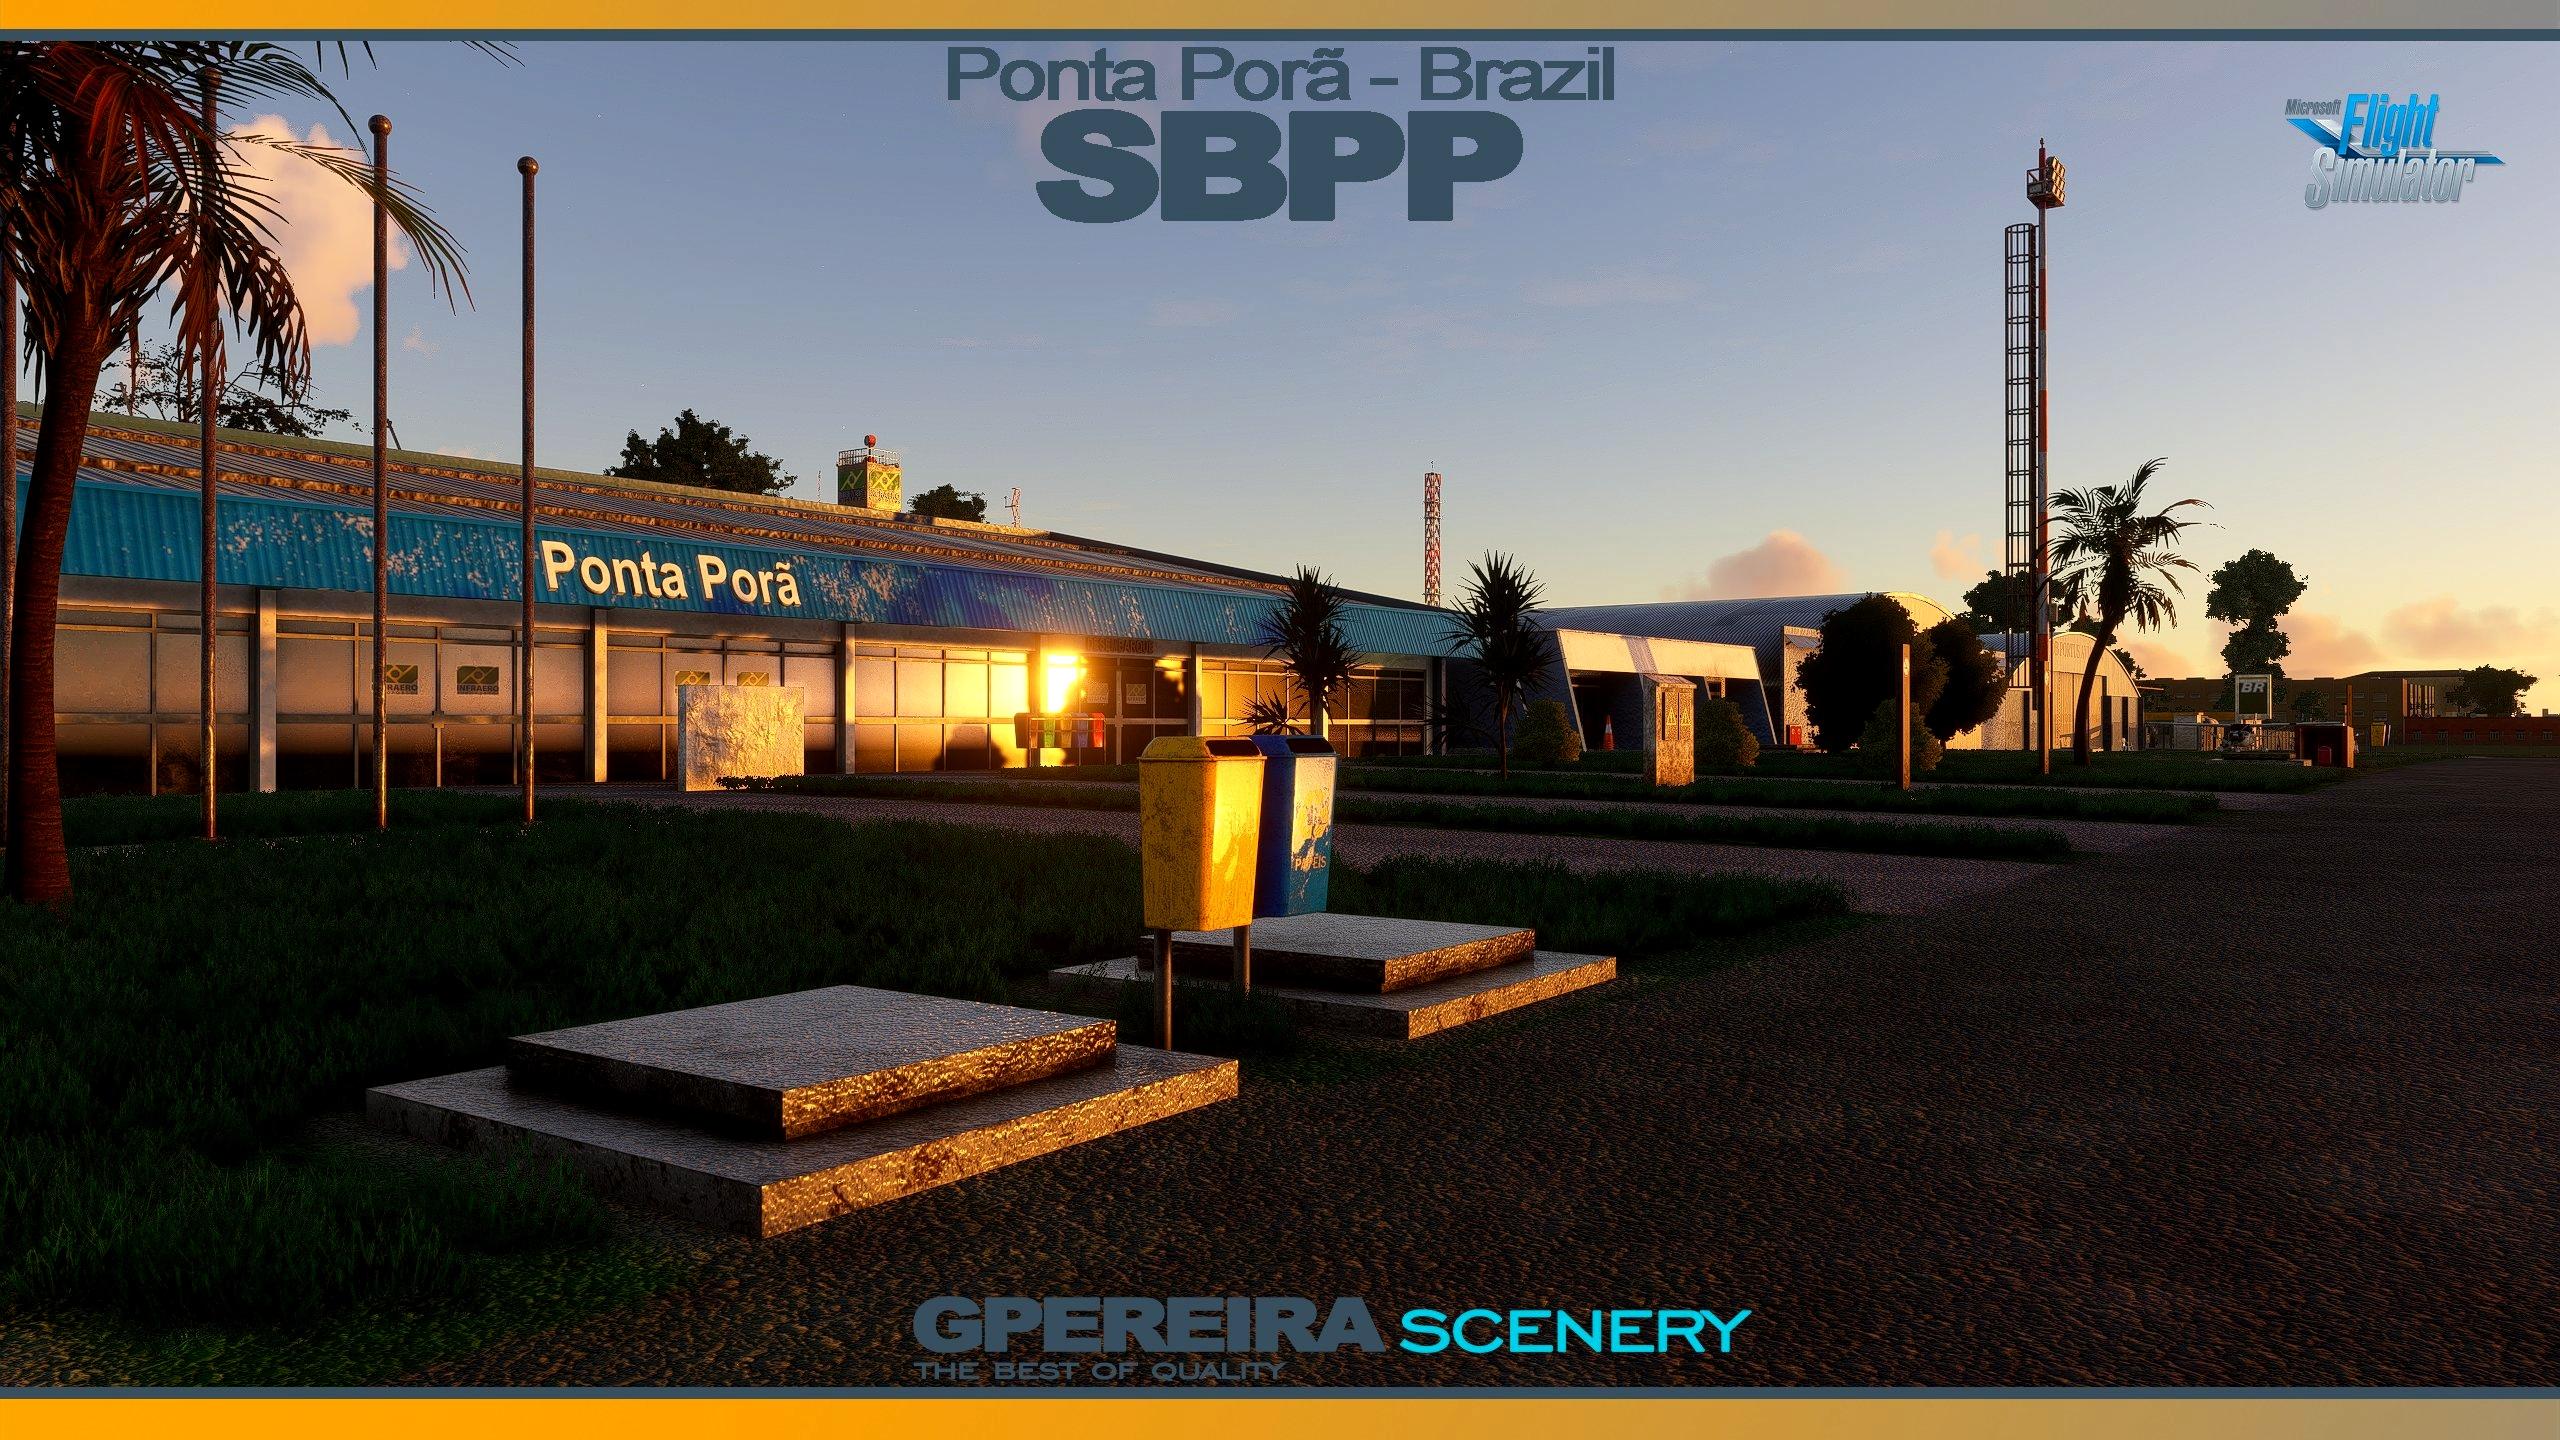 GPEREIRA SCENERY - PONTA PORÃ INTERNATIONAL - SBPP - BRAZIL MSFS Microsoft Flight Simulator